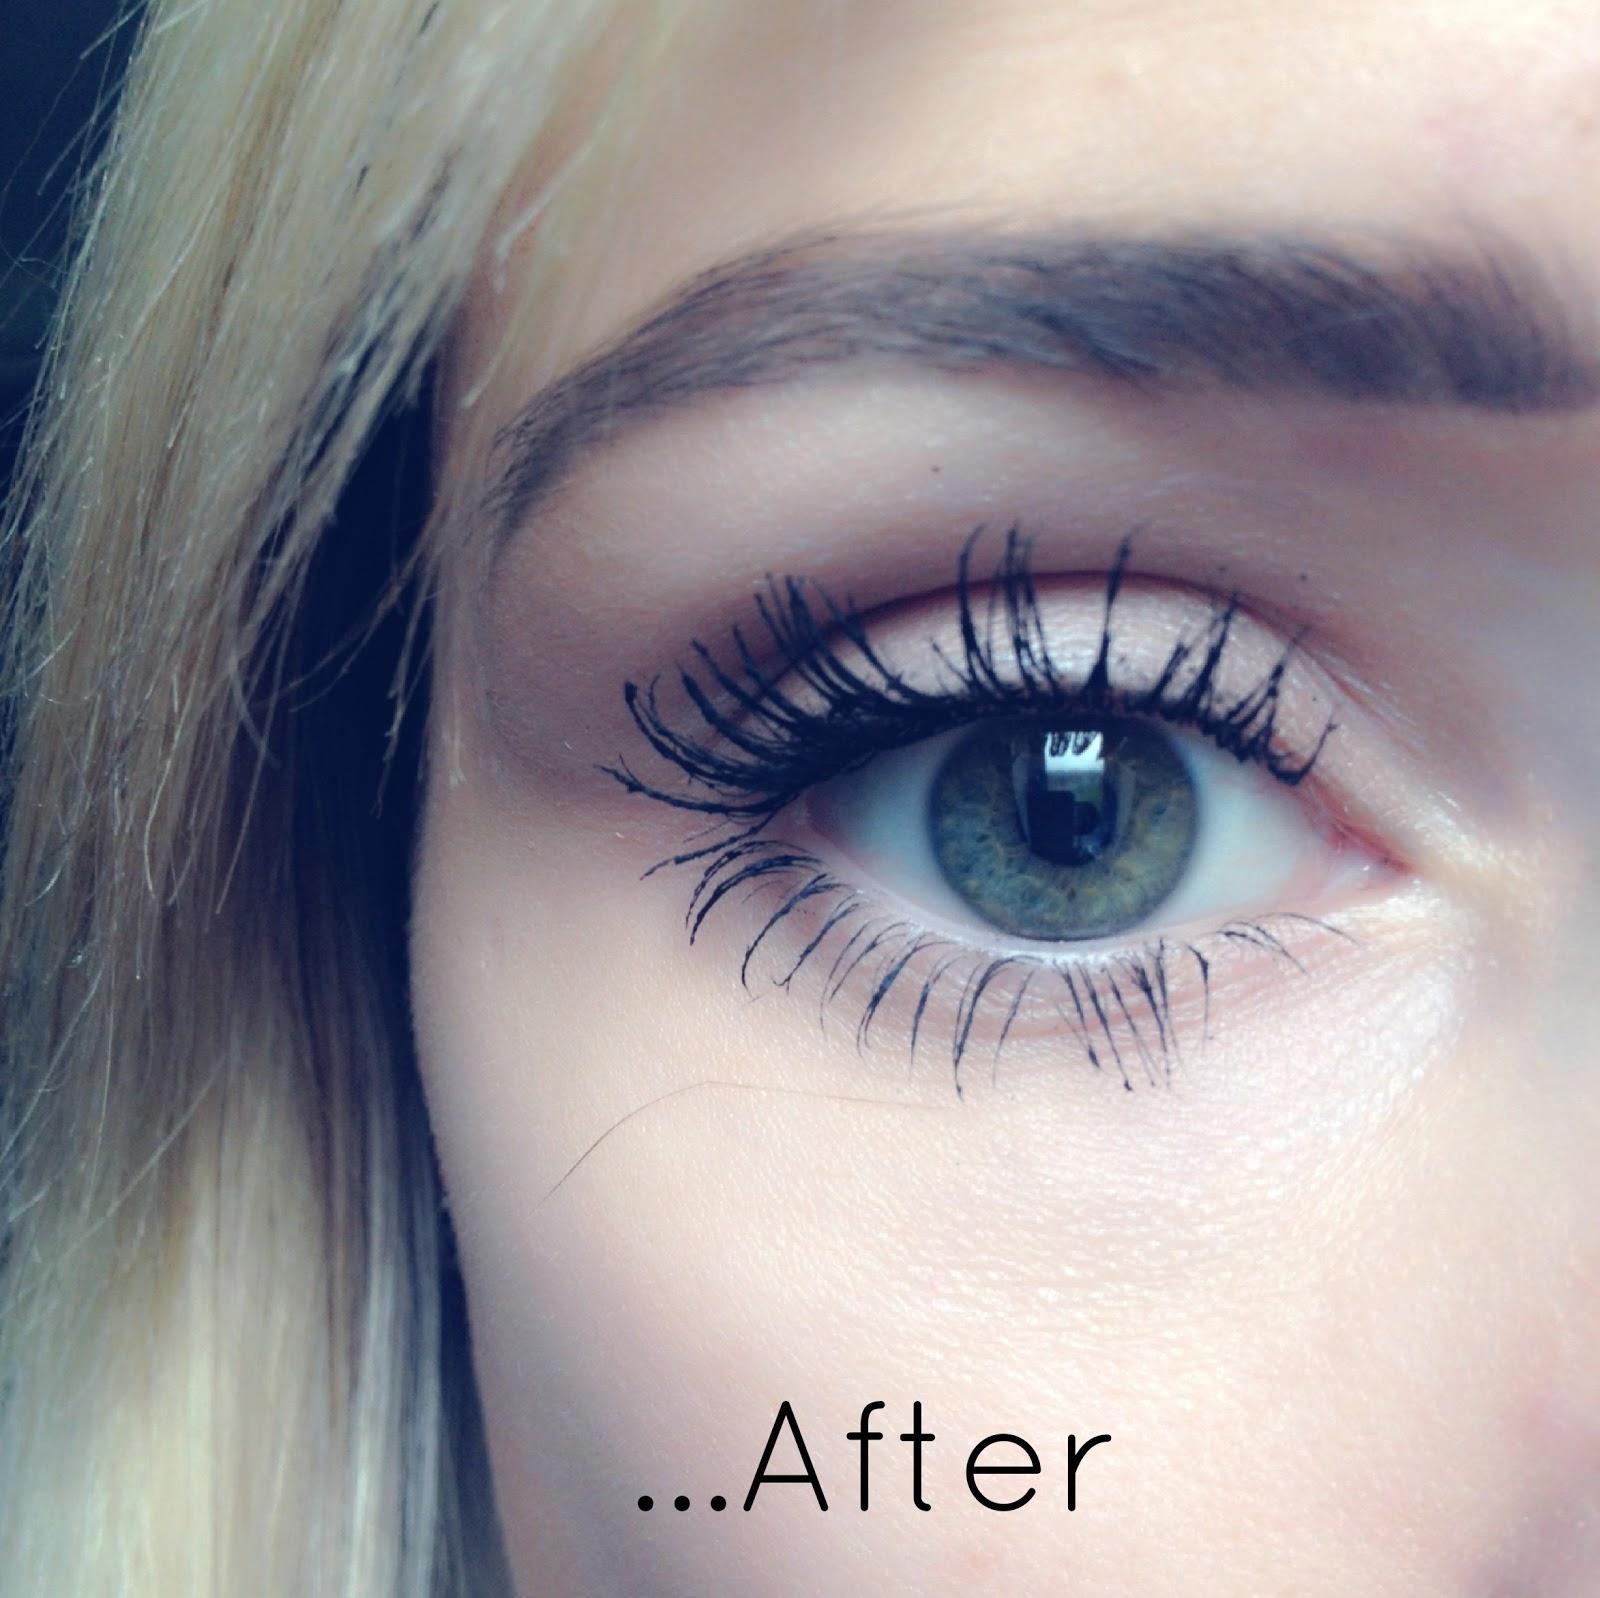 Good mat lipstick: Do over plucked eyebrows grow back